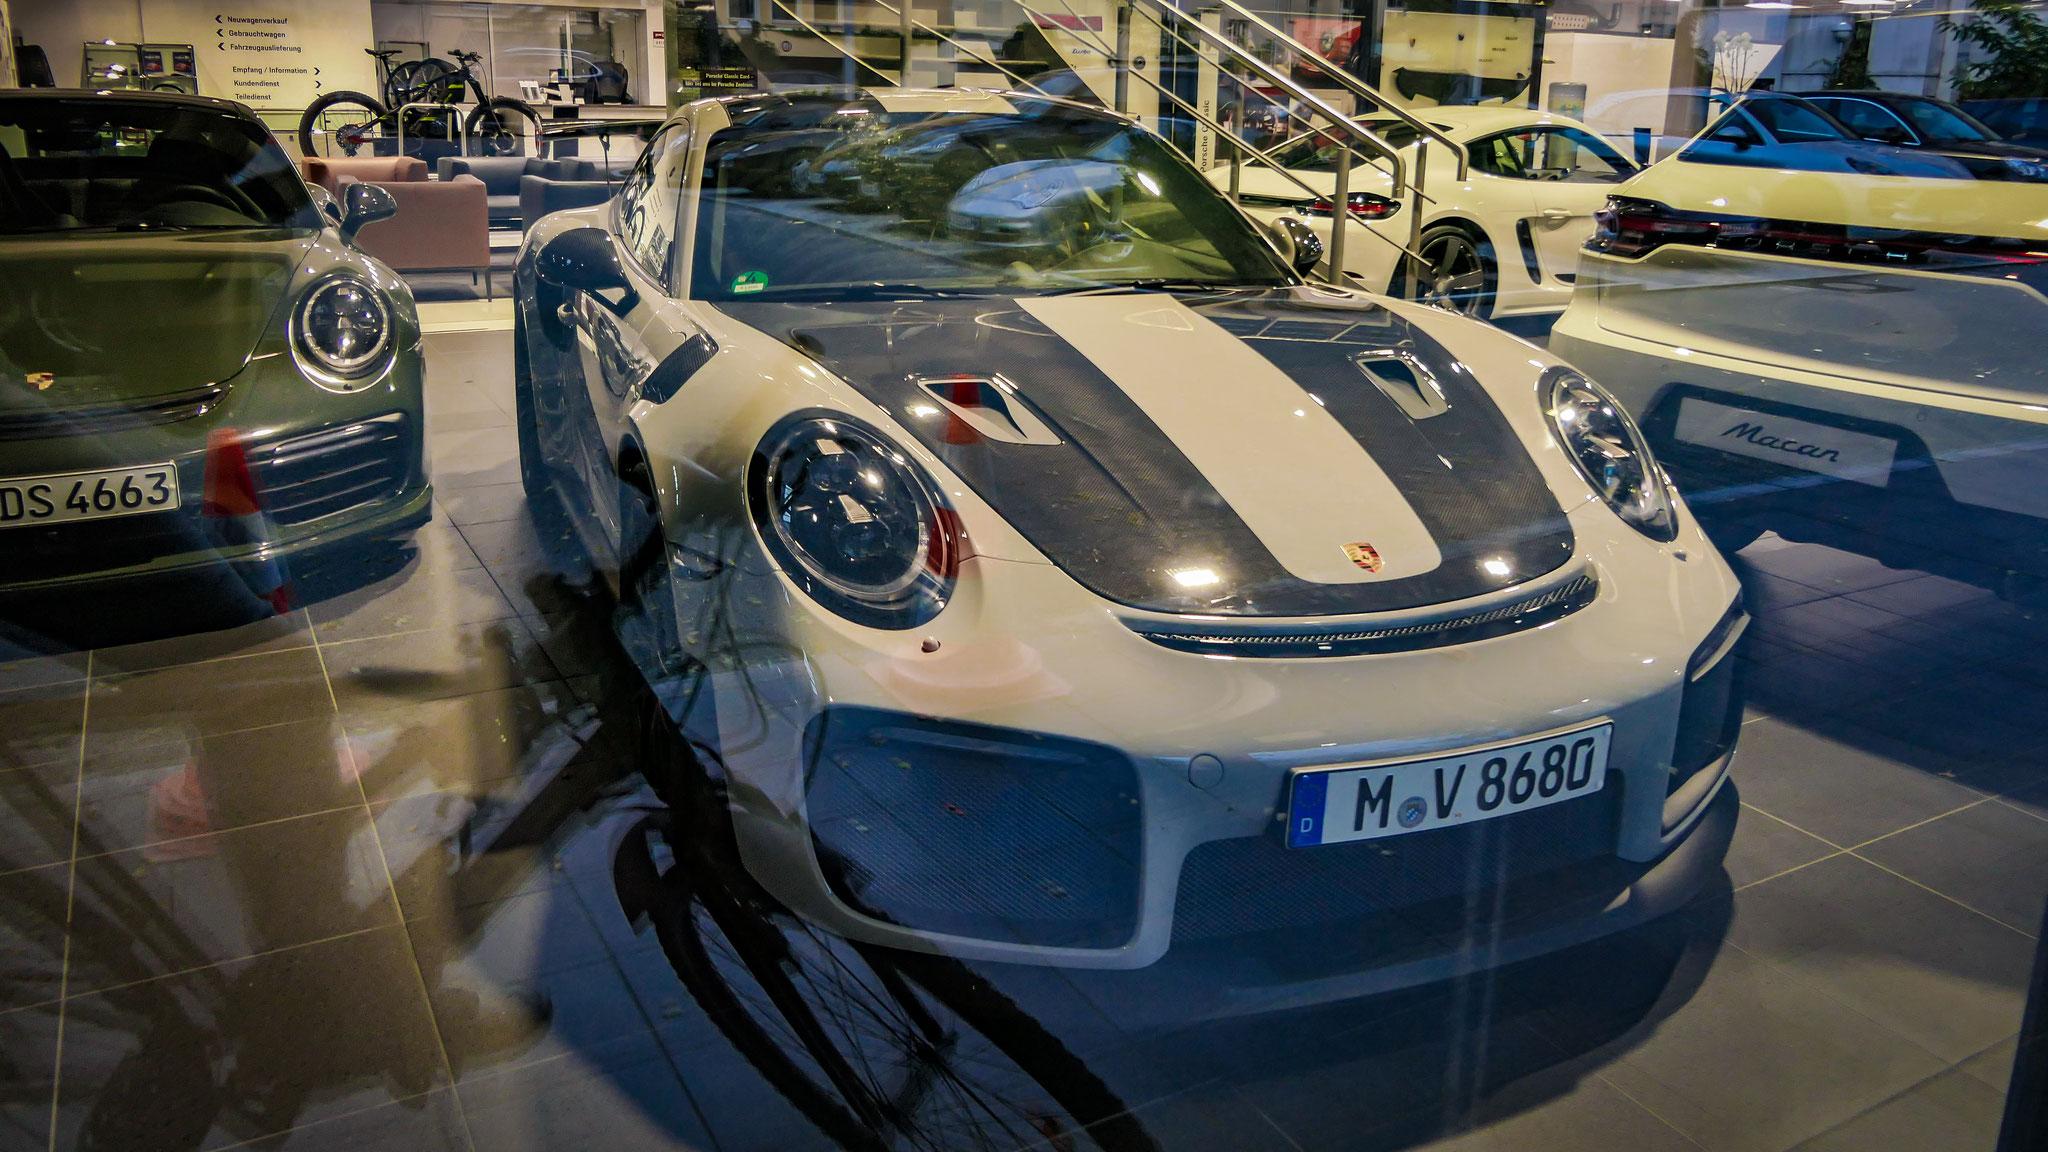 Porsche 911 GT2 RS - M-V-8680